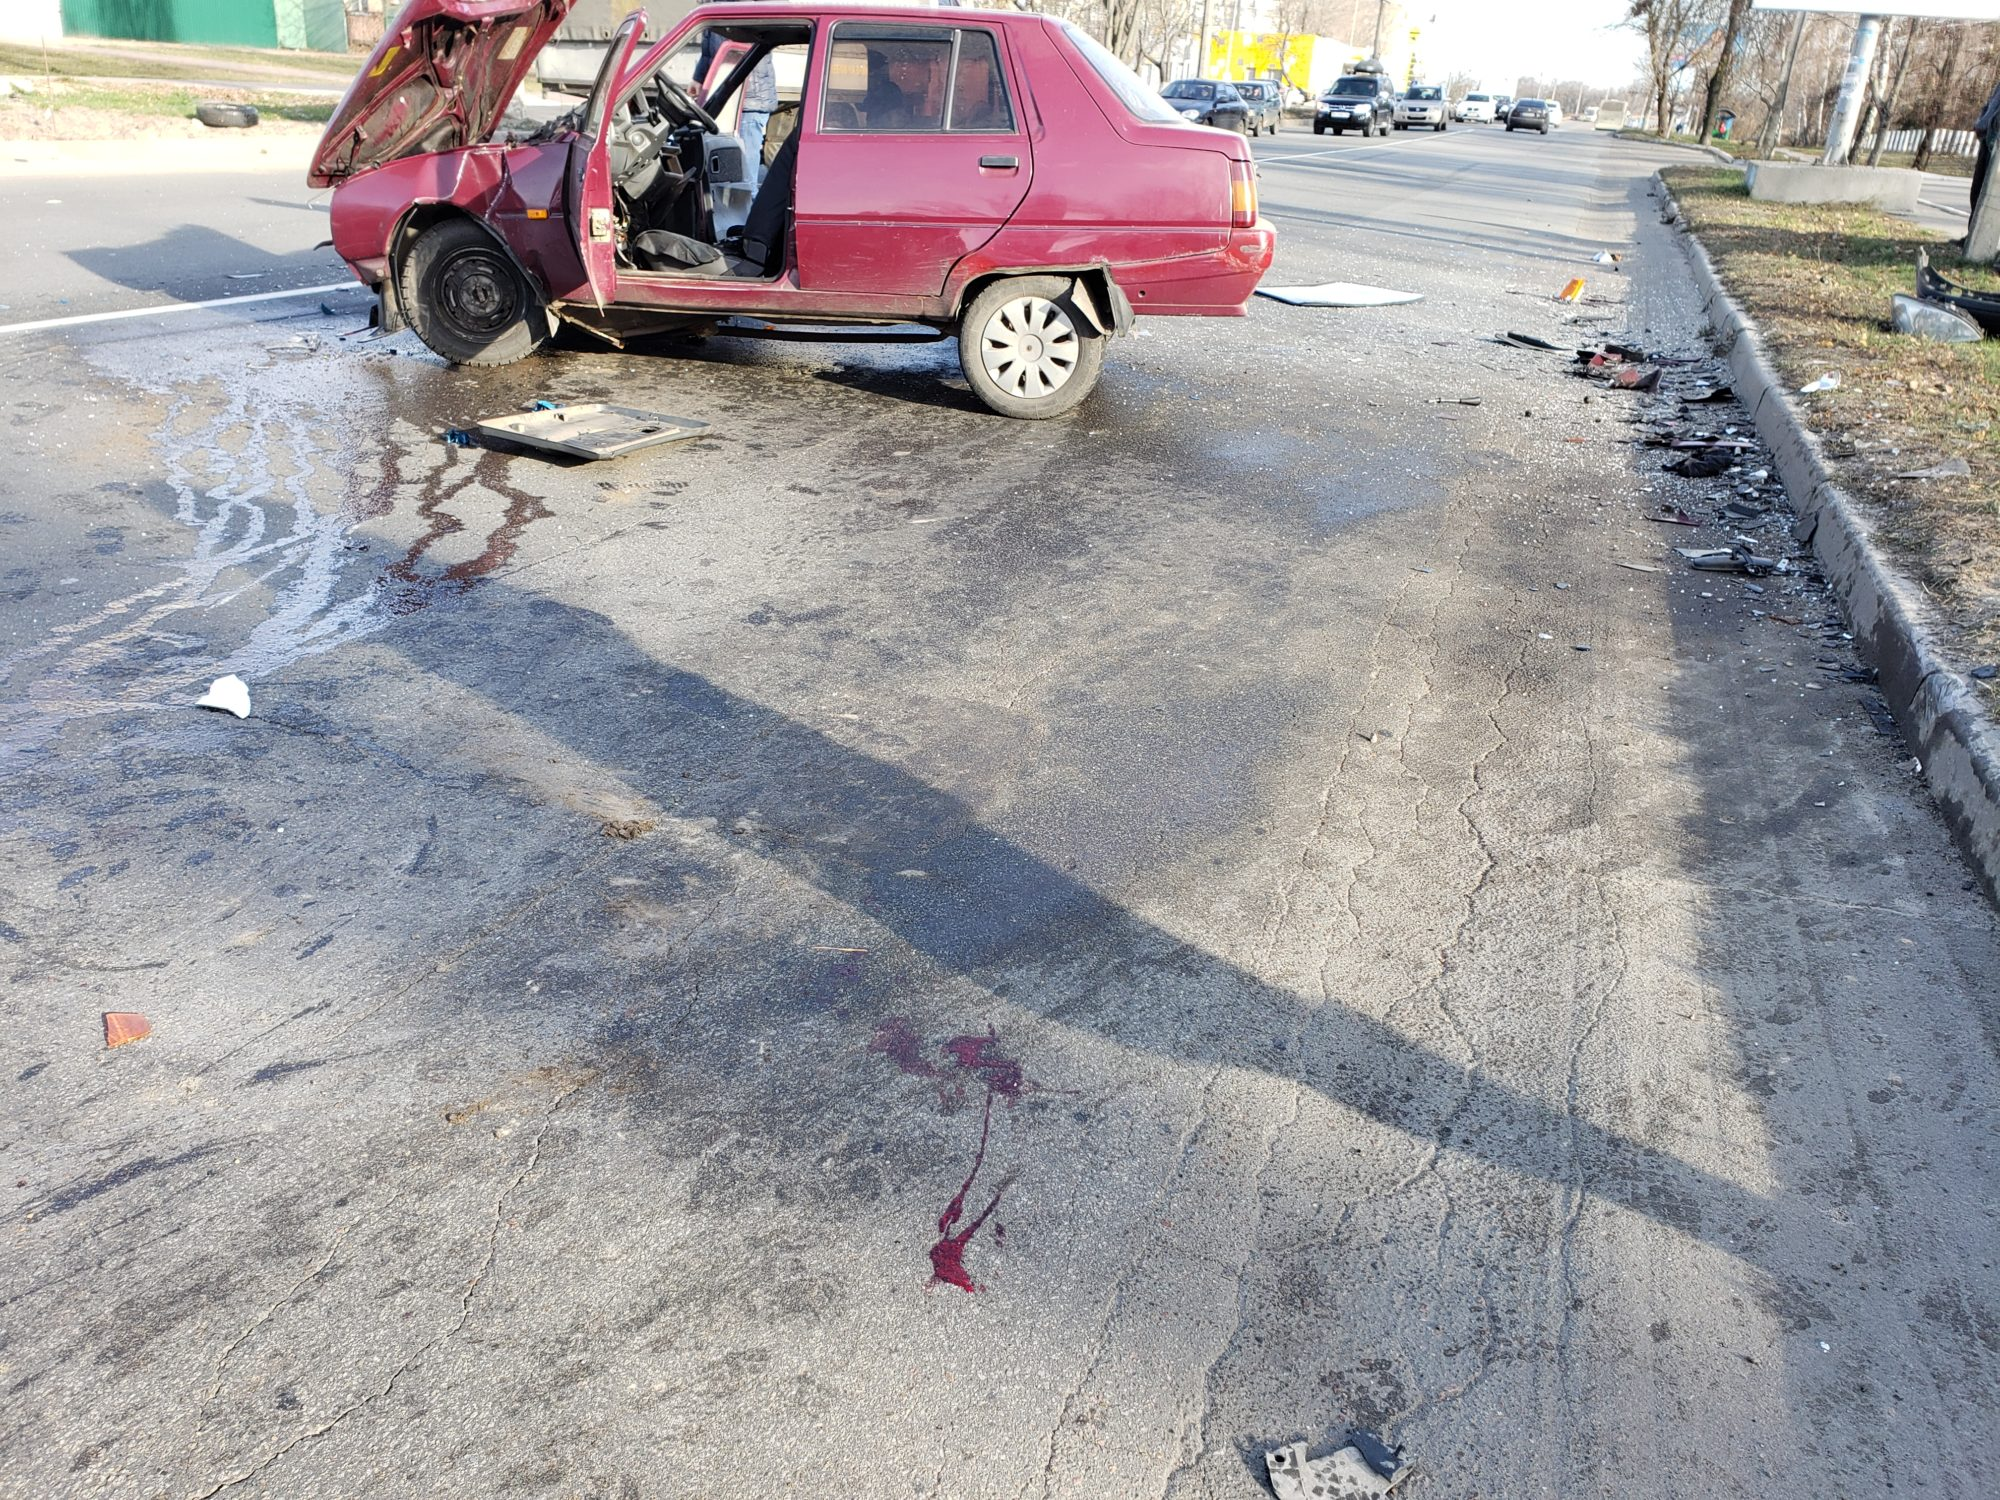 20191123_113003-2000x1500 Славута&Mercedes: у Броварах сталася ДТП